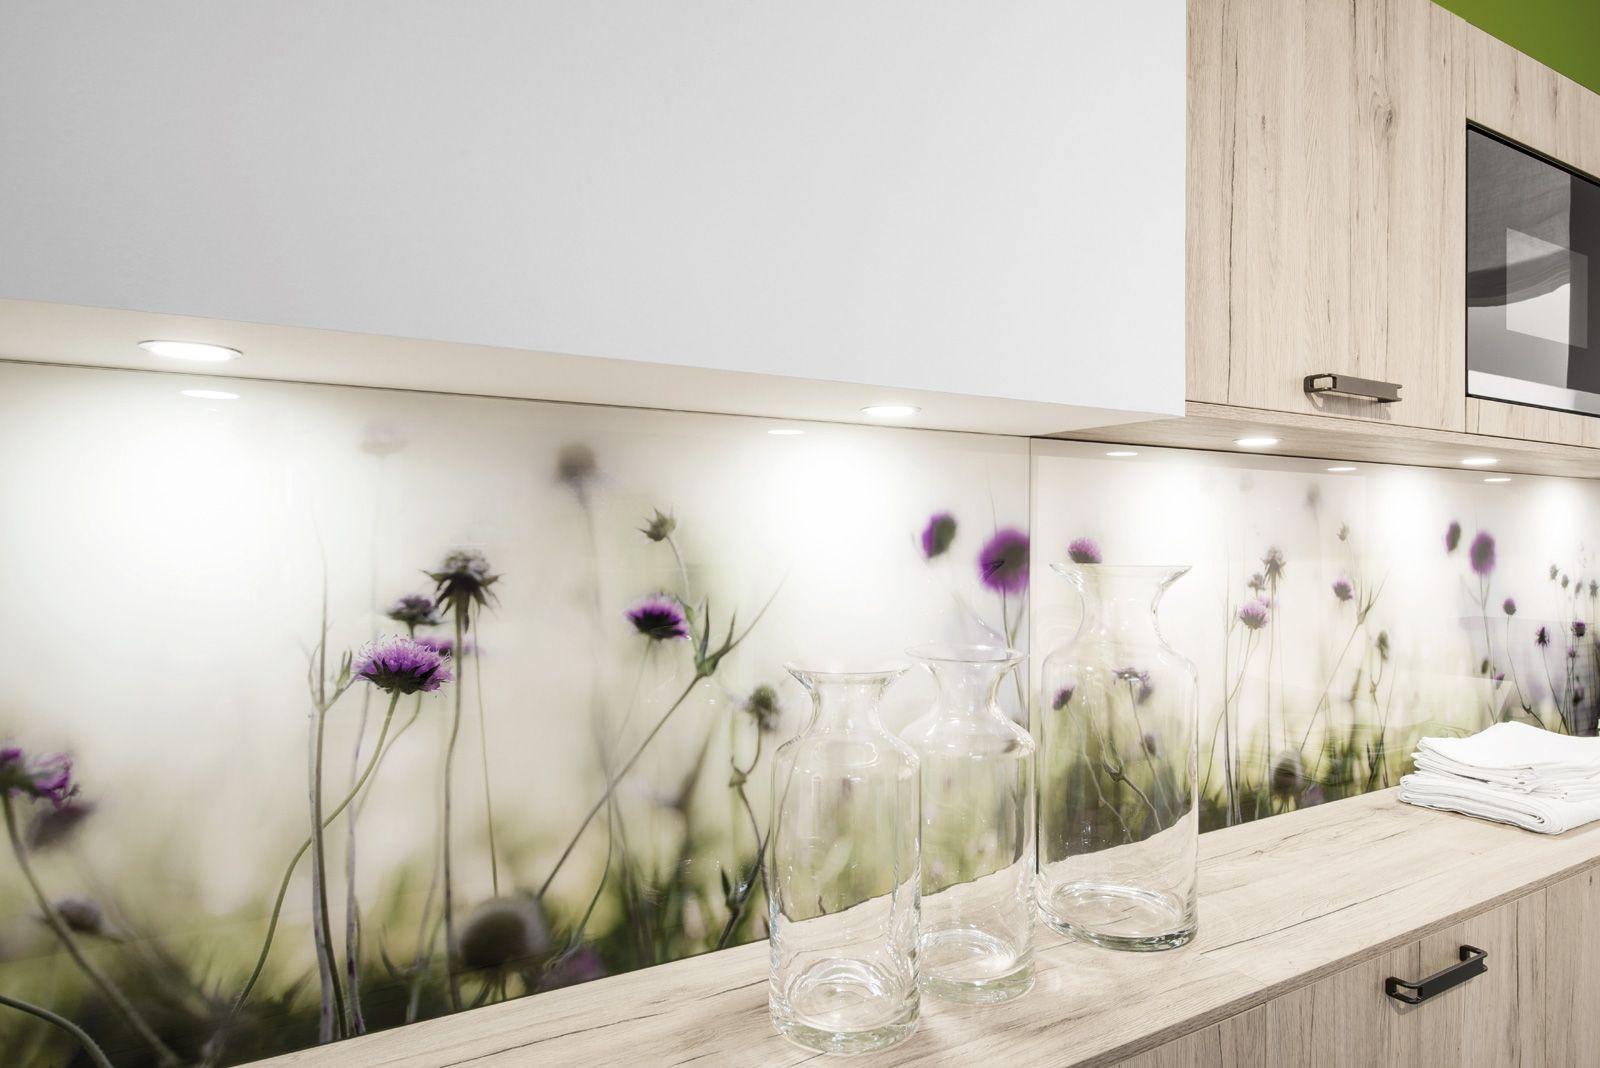 Full Size of Glaswand Küche Glaswand Küche Wohnzimmer Hinterleuchtete Glaswand Küche Glaswand Küche Spritzschutz Küche Glaswand Küche